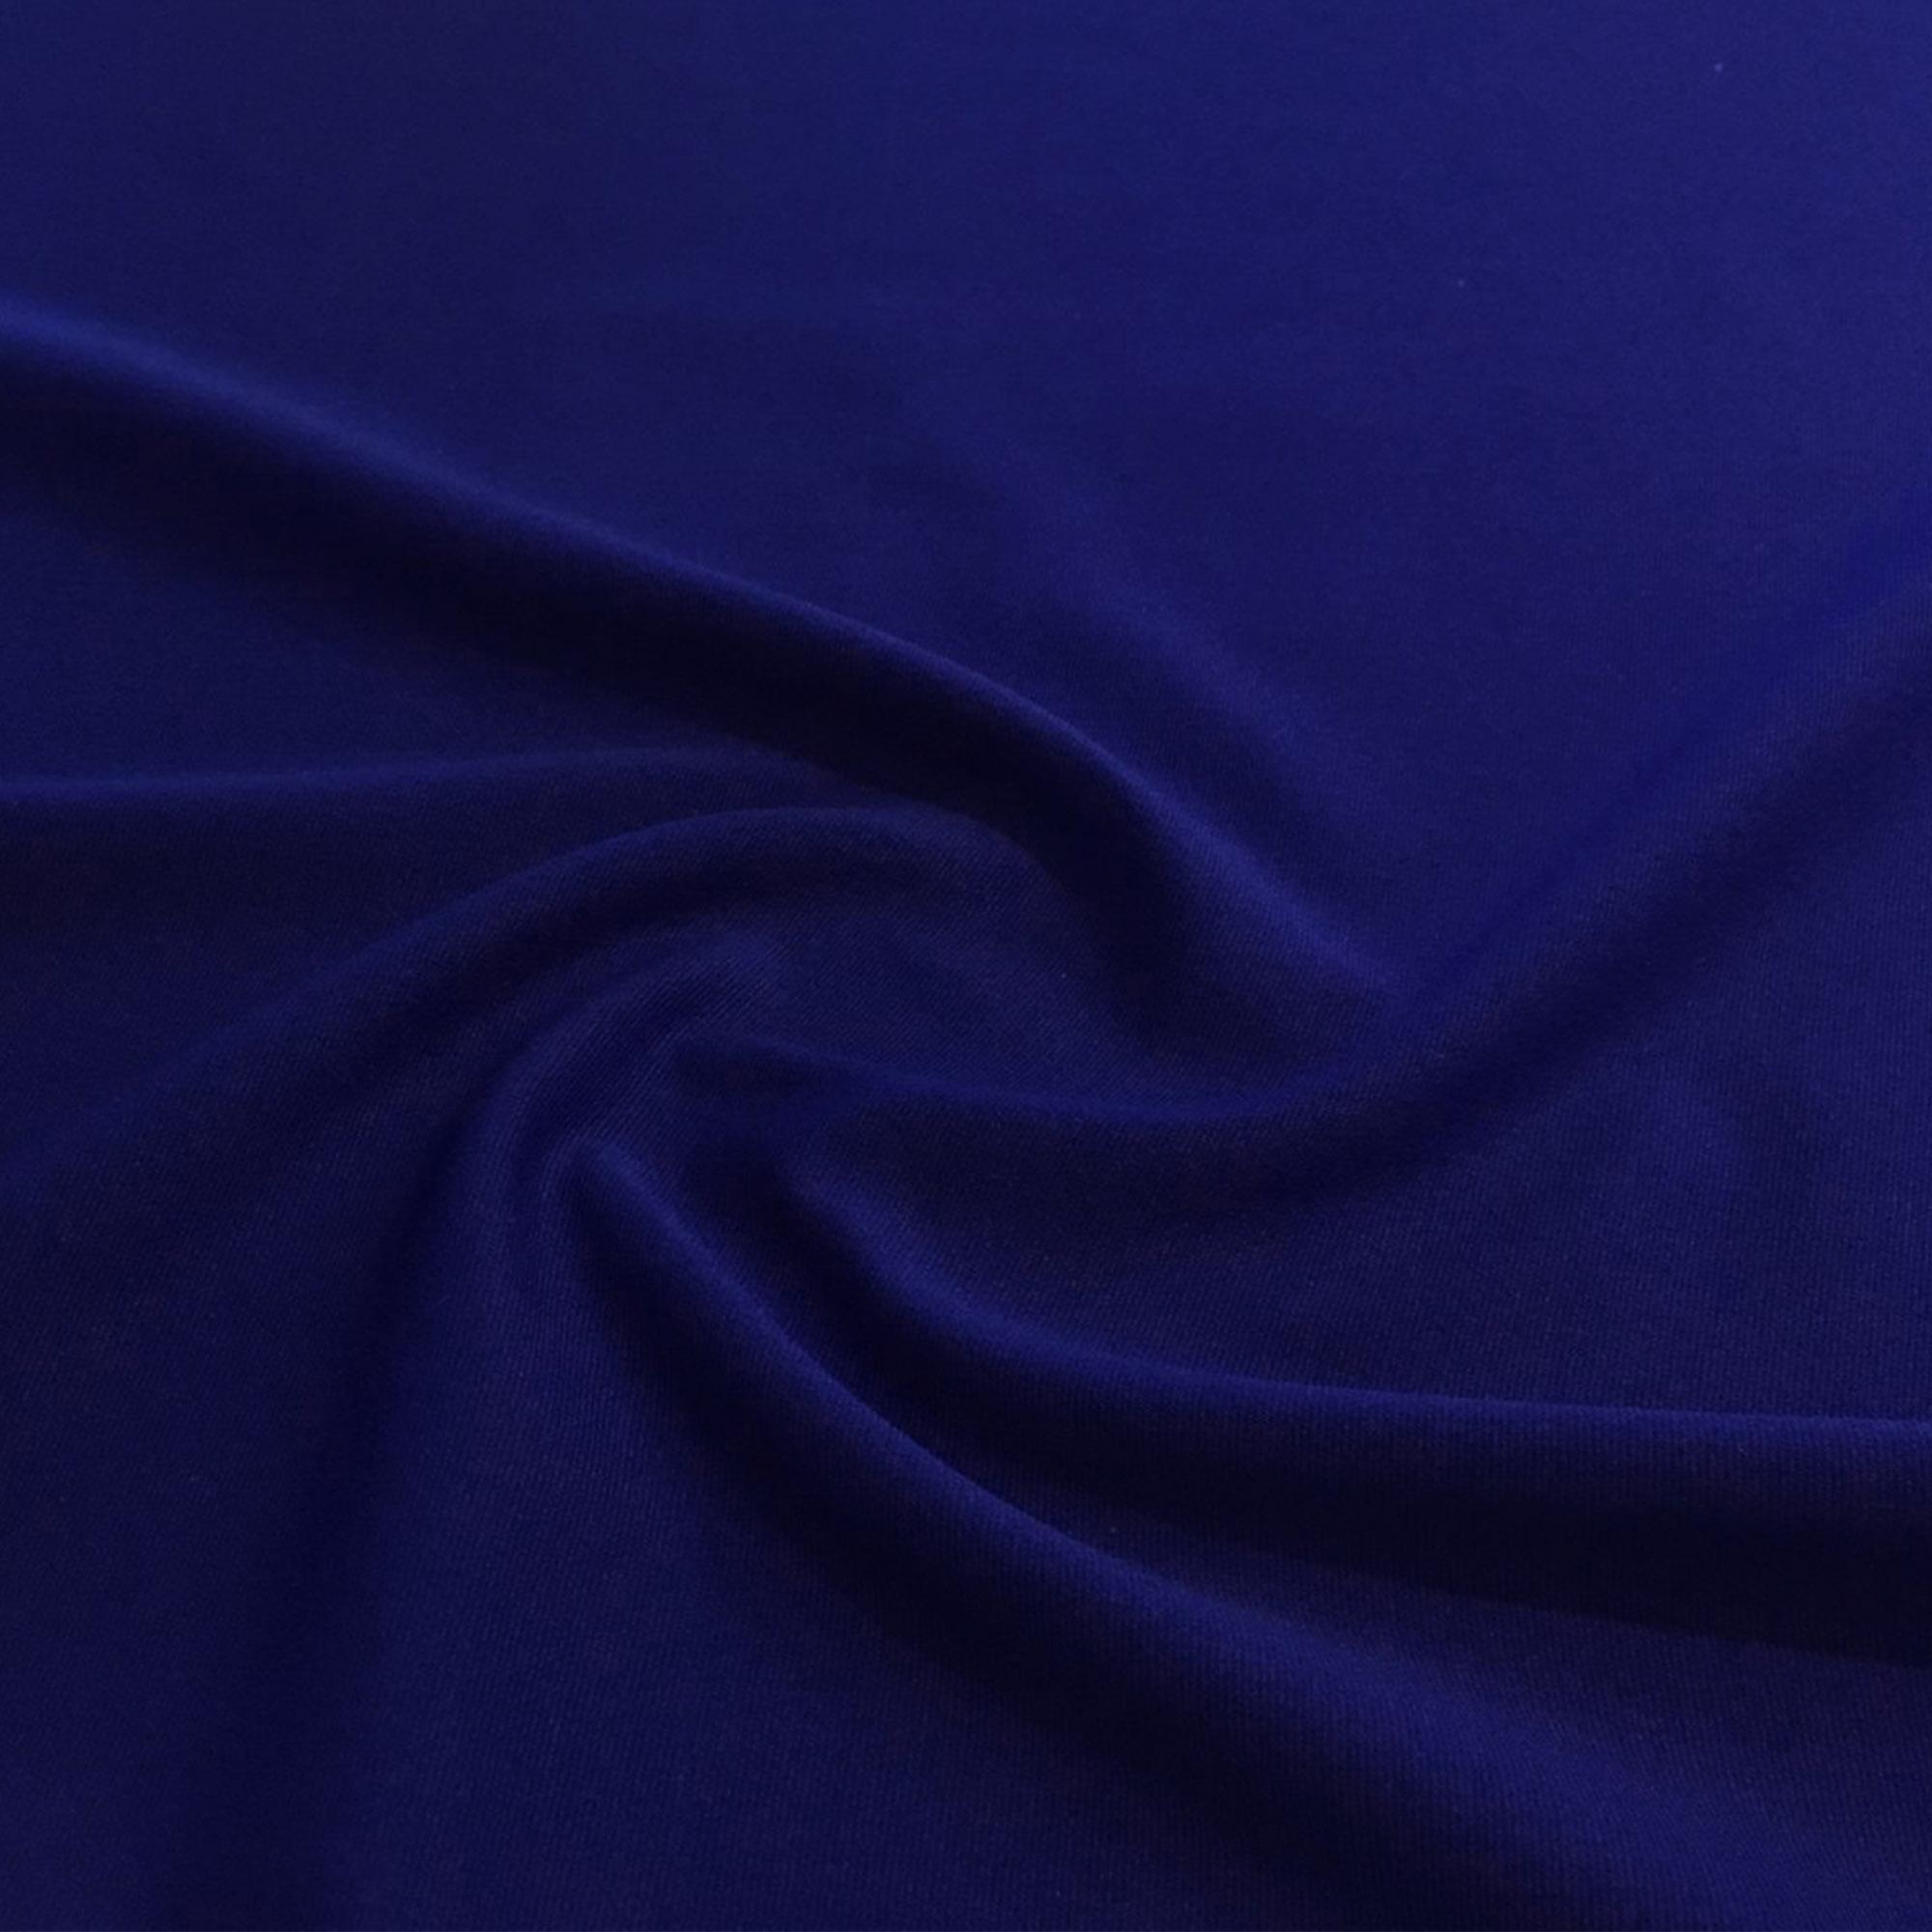 Poliplex Liso Azulão